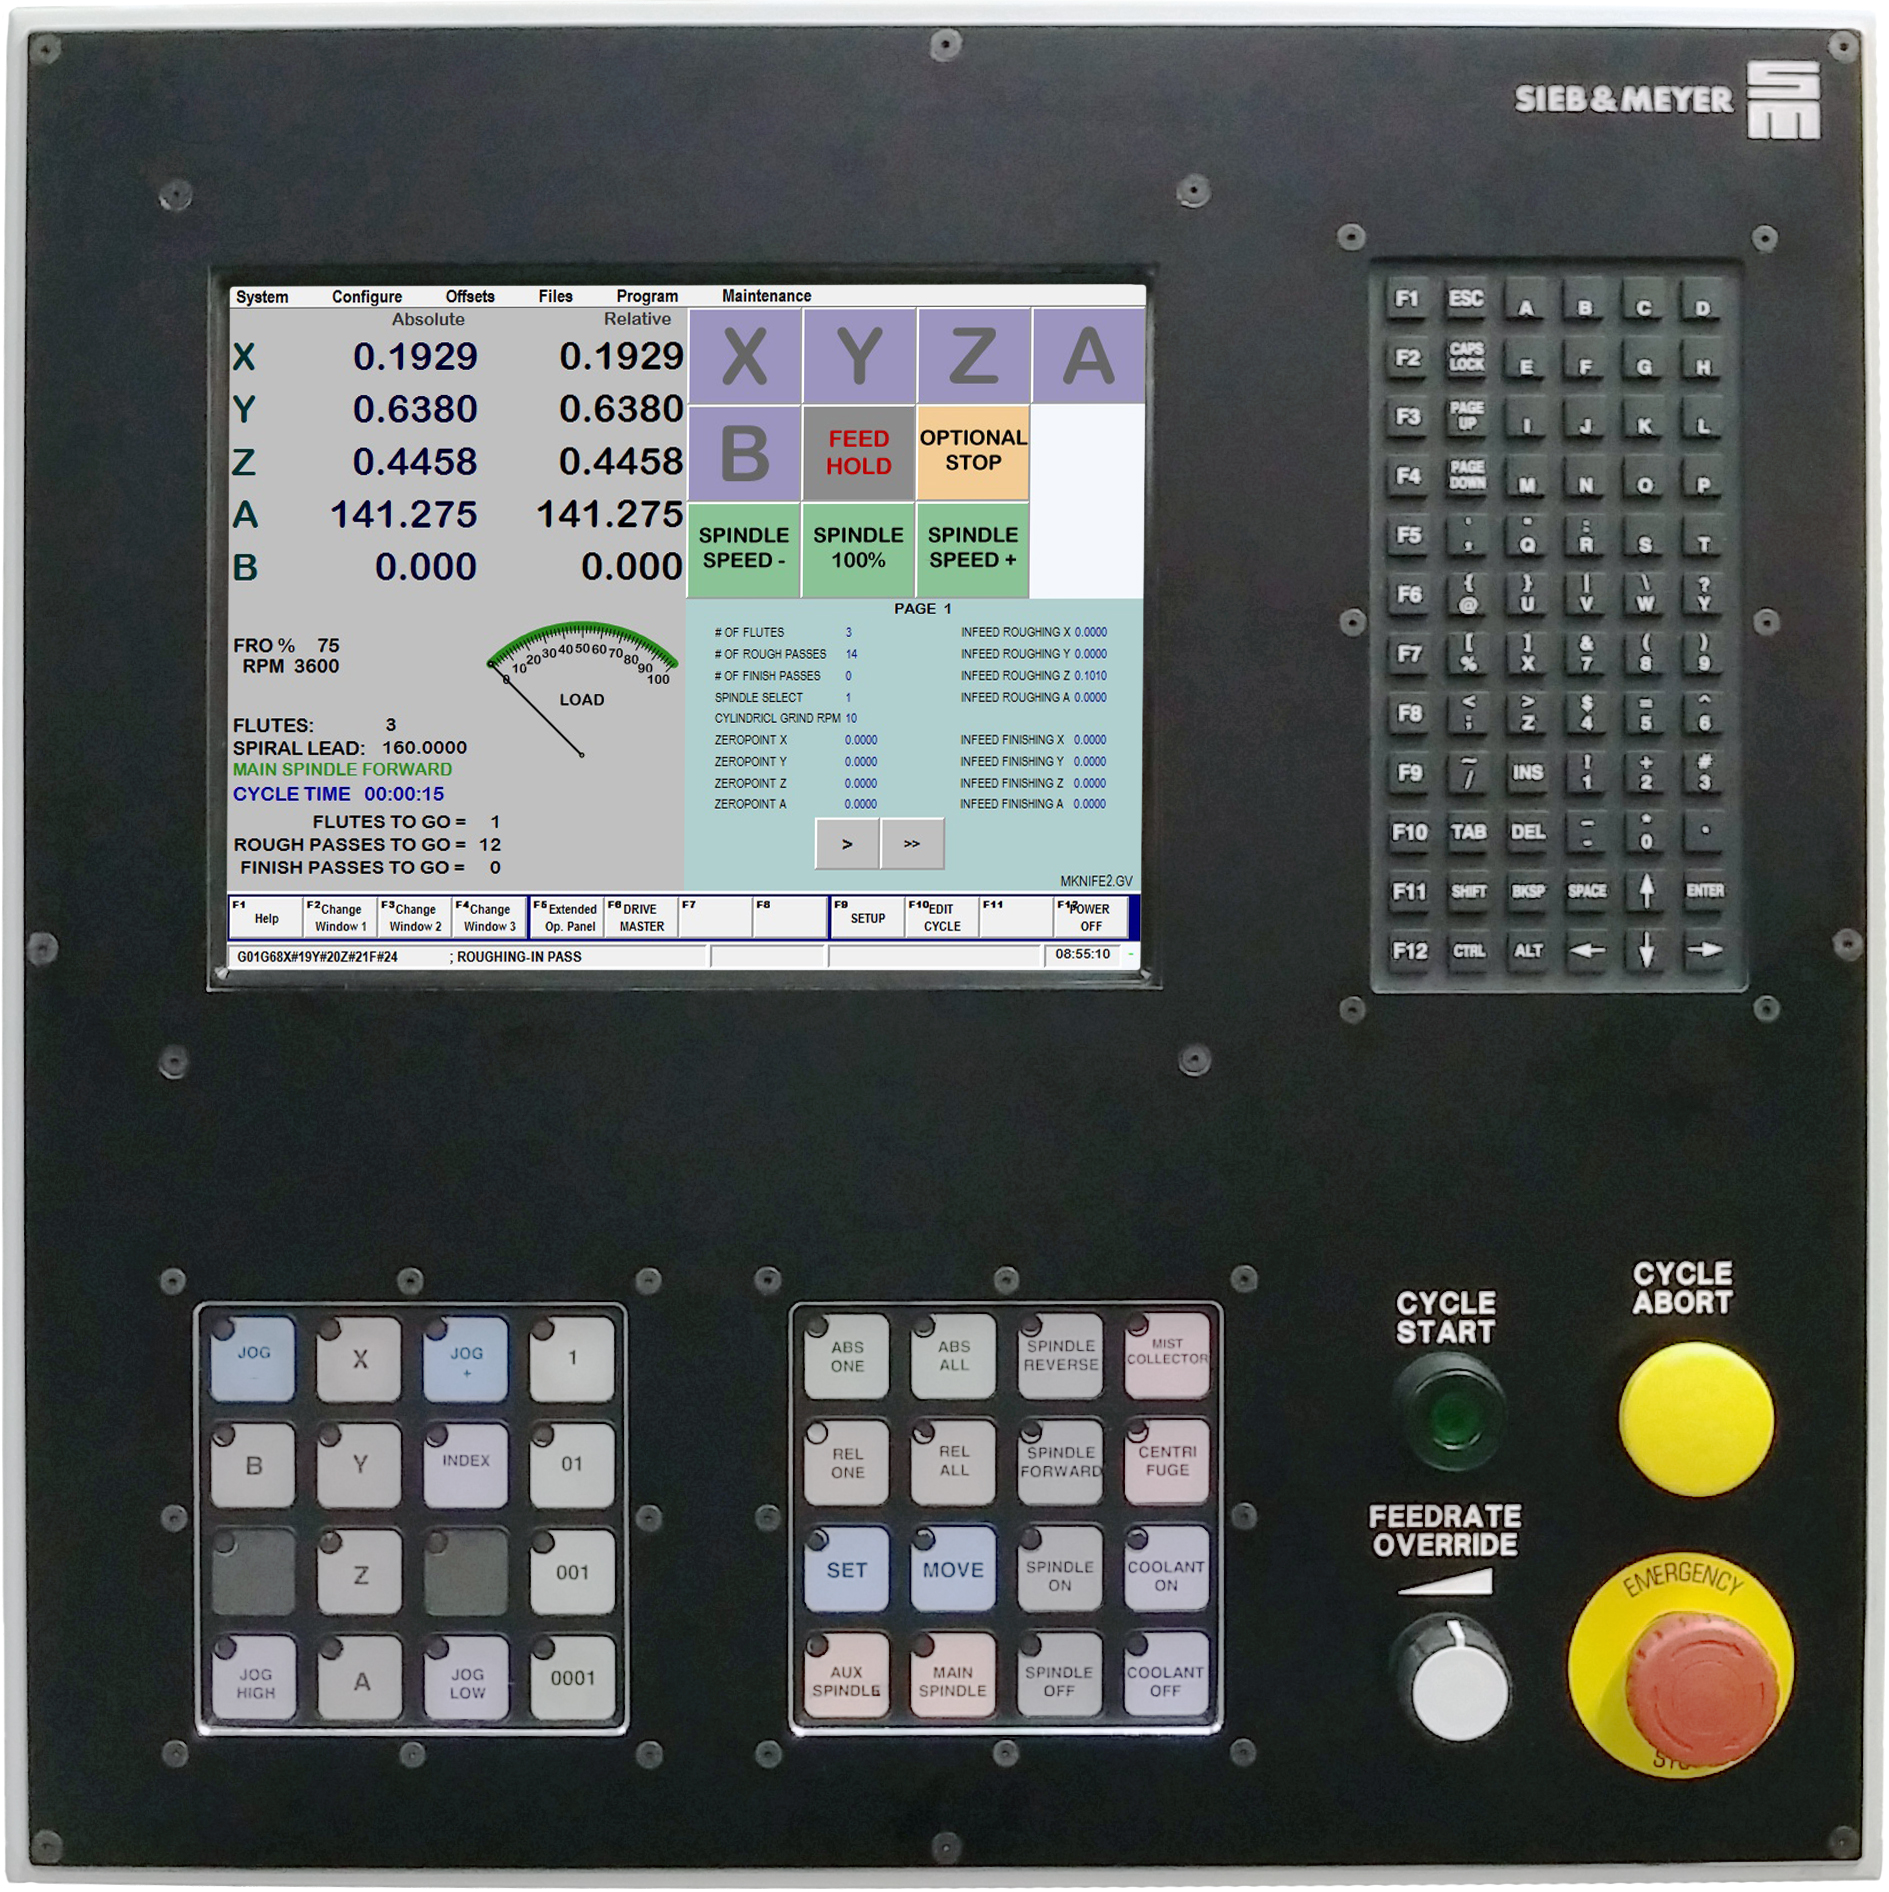 SIEB & MEYER CNC PMC 9 FRONT OPERATOR PENDANT